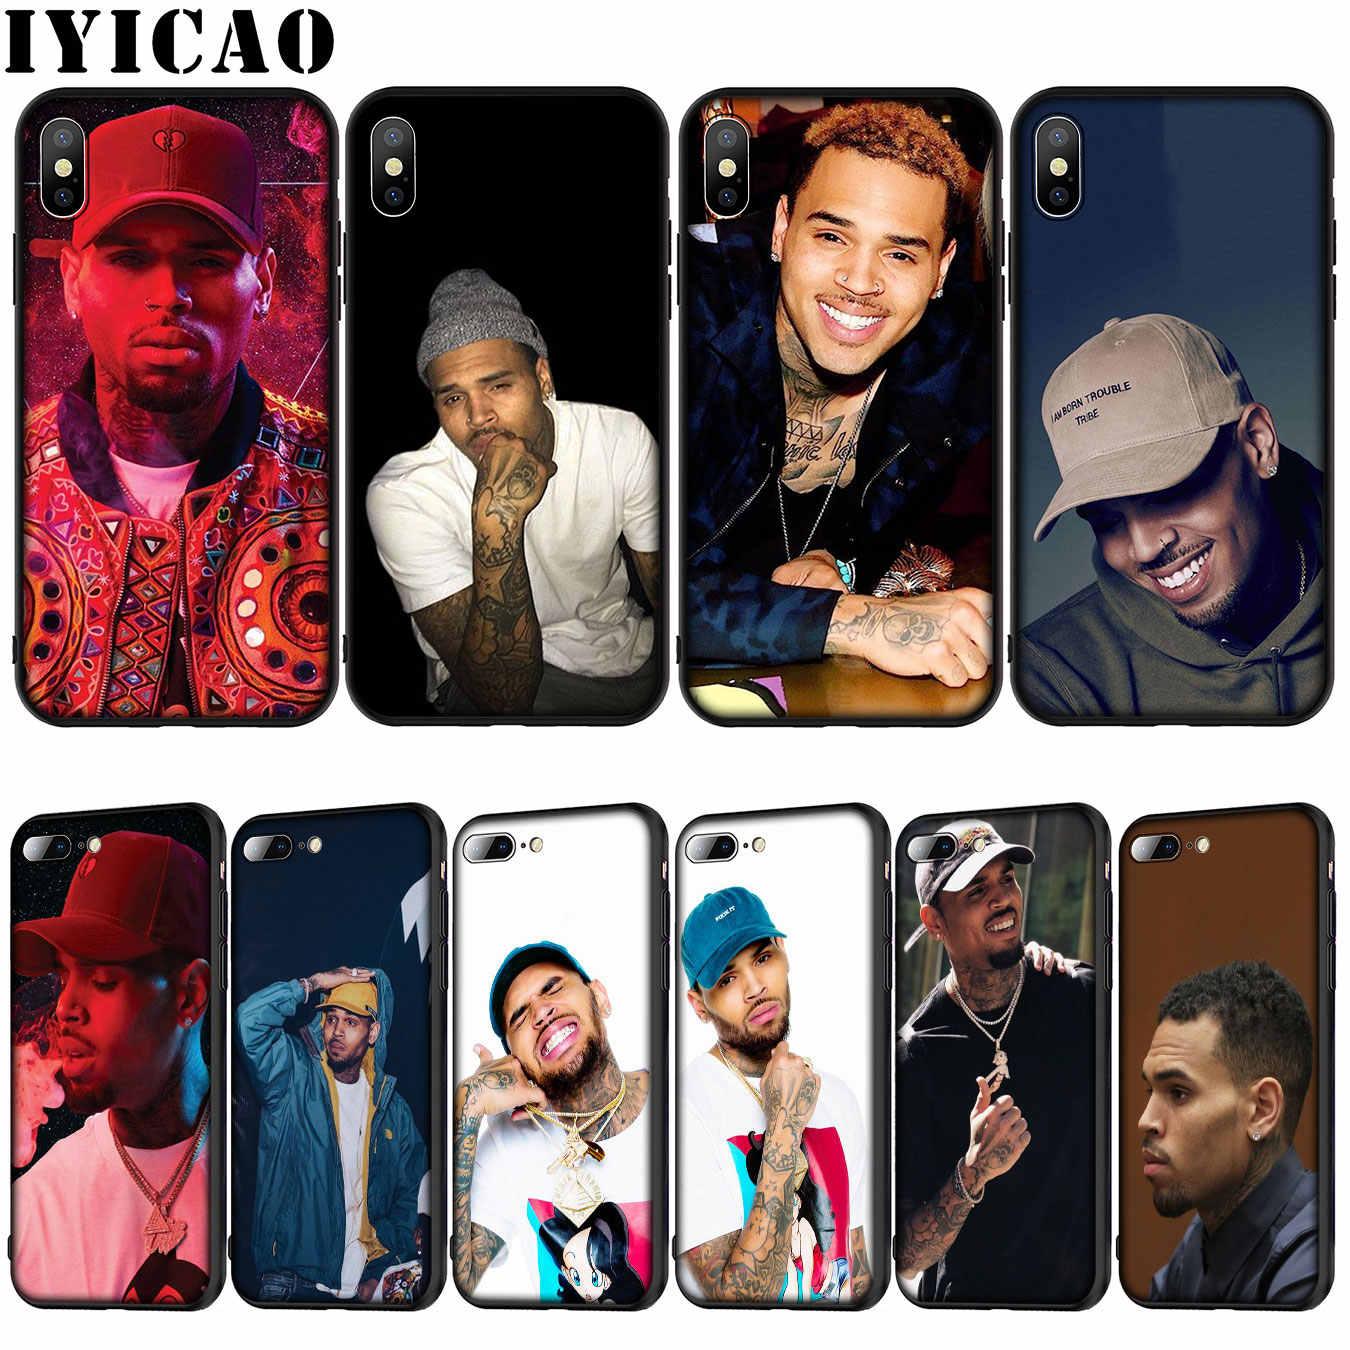 IYICAO كريس براون لينة غطاء سيليكون حالة ل فون 12 البسيطة XR X XS 11 برو ماكس 10 6 6S 7 8 زائد 5S SE الهاتف حالة